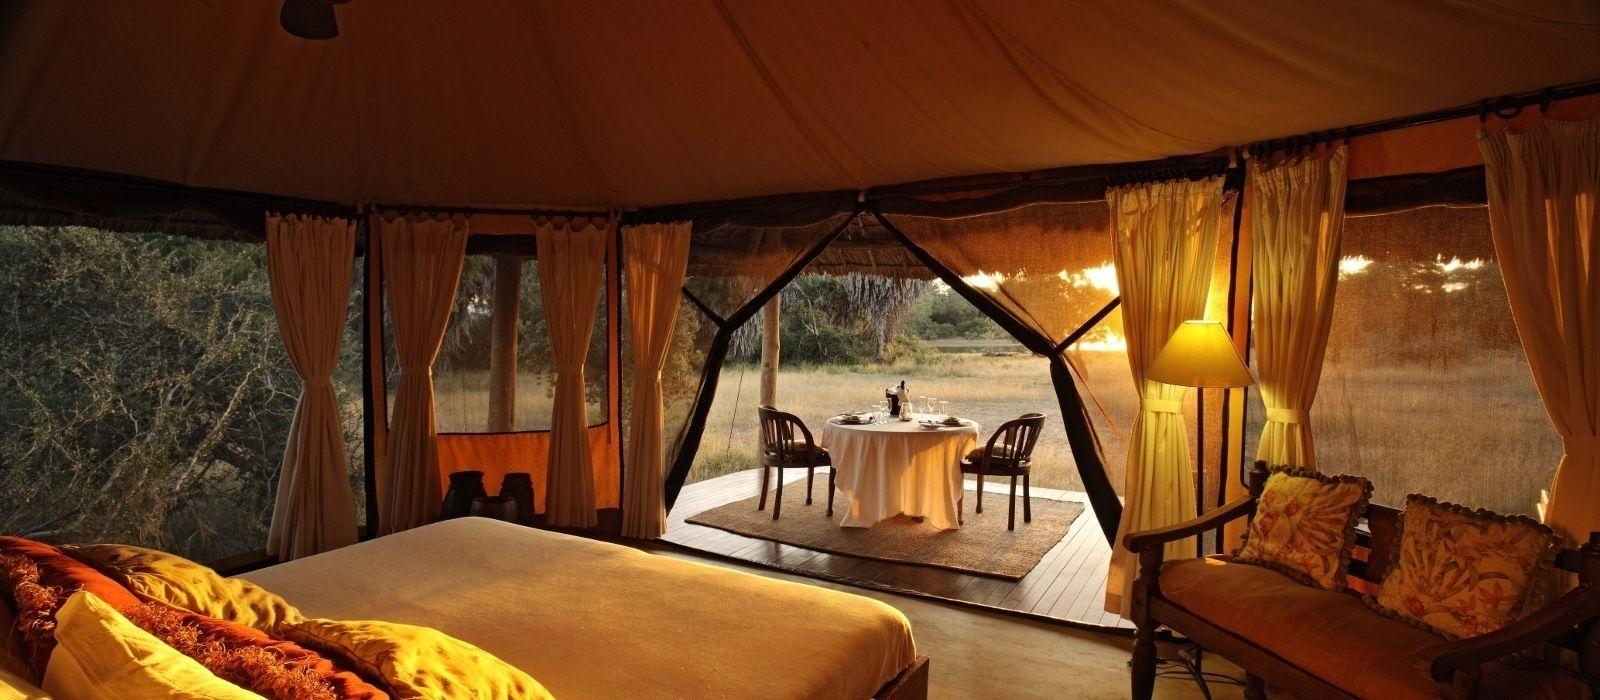 Tanzania – Southern Wilderness and Beach Tour Trip 8